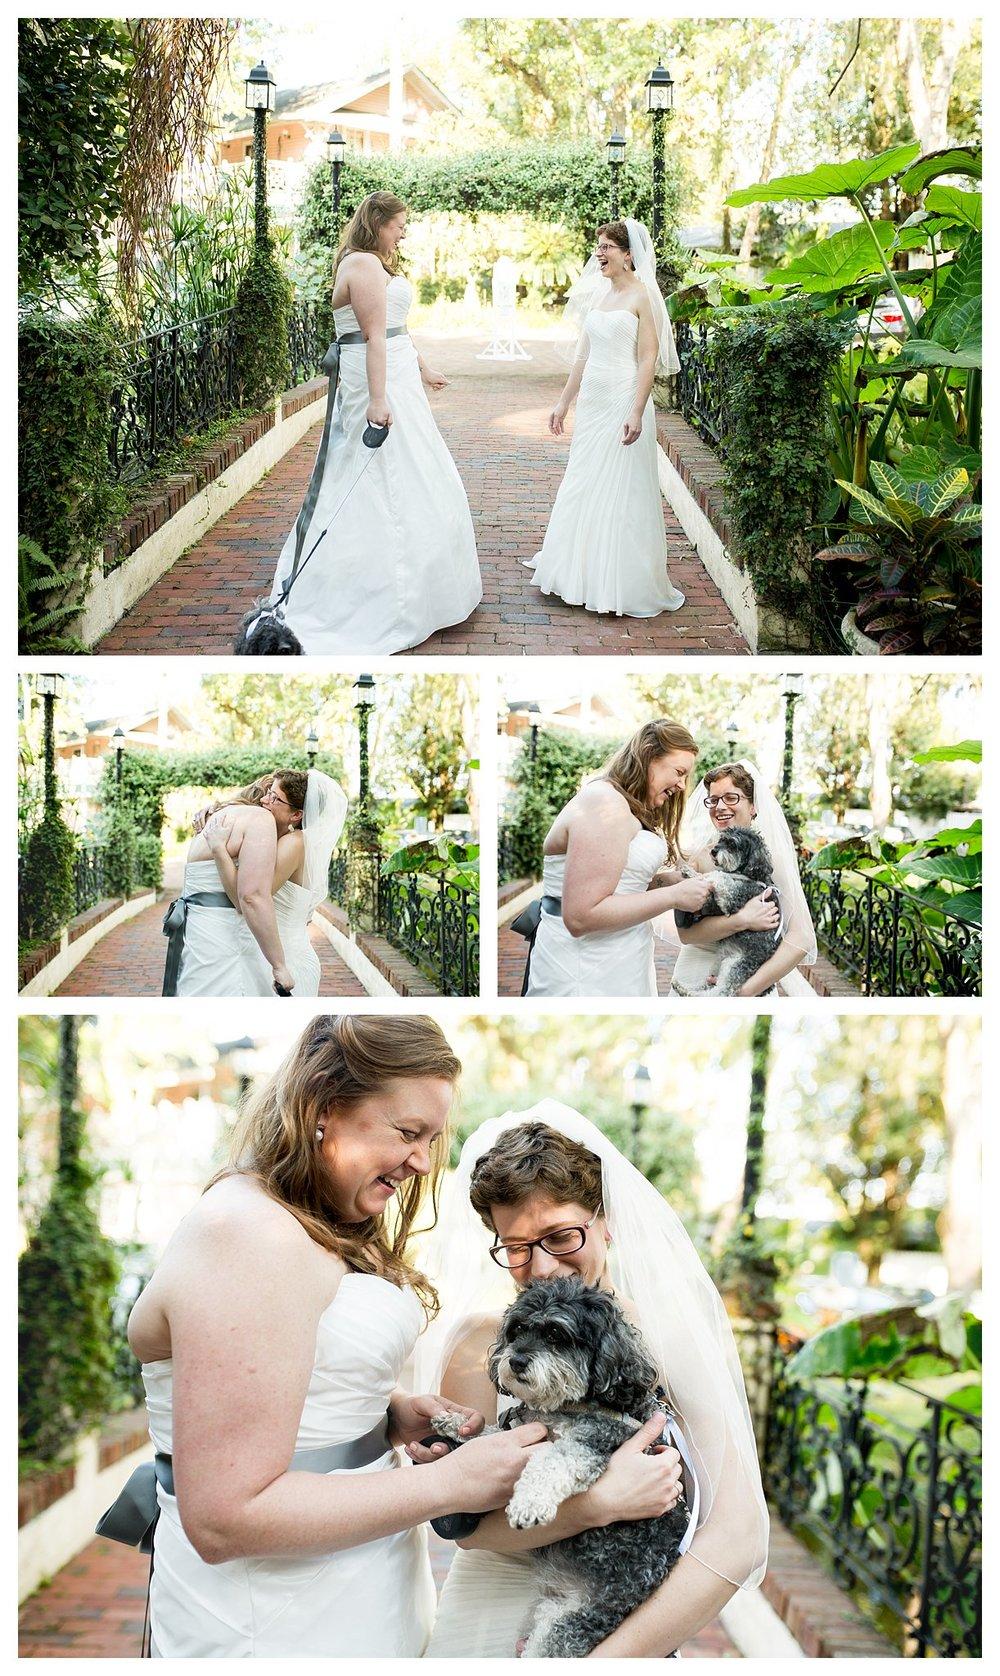 everleigh-photography-cincinnati-wedding-photographer-cincinnati-wedding-photography-sweetwater-branch-inn-gainesville-florida-wedding-13